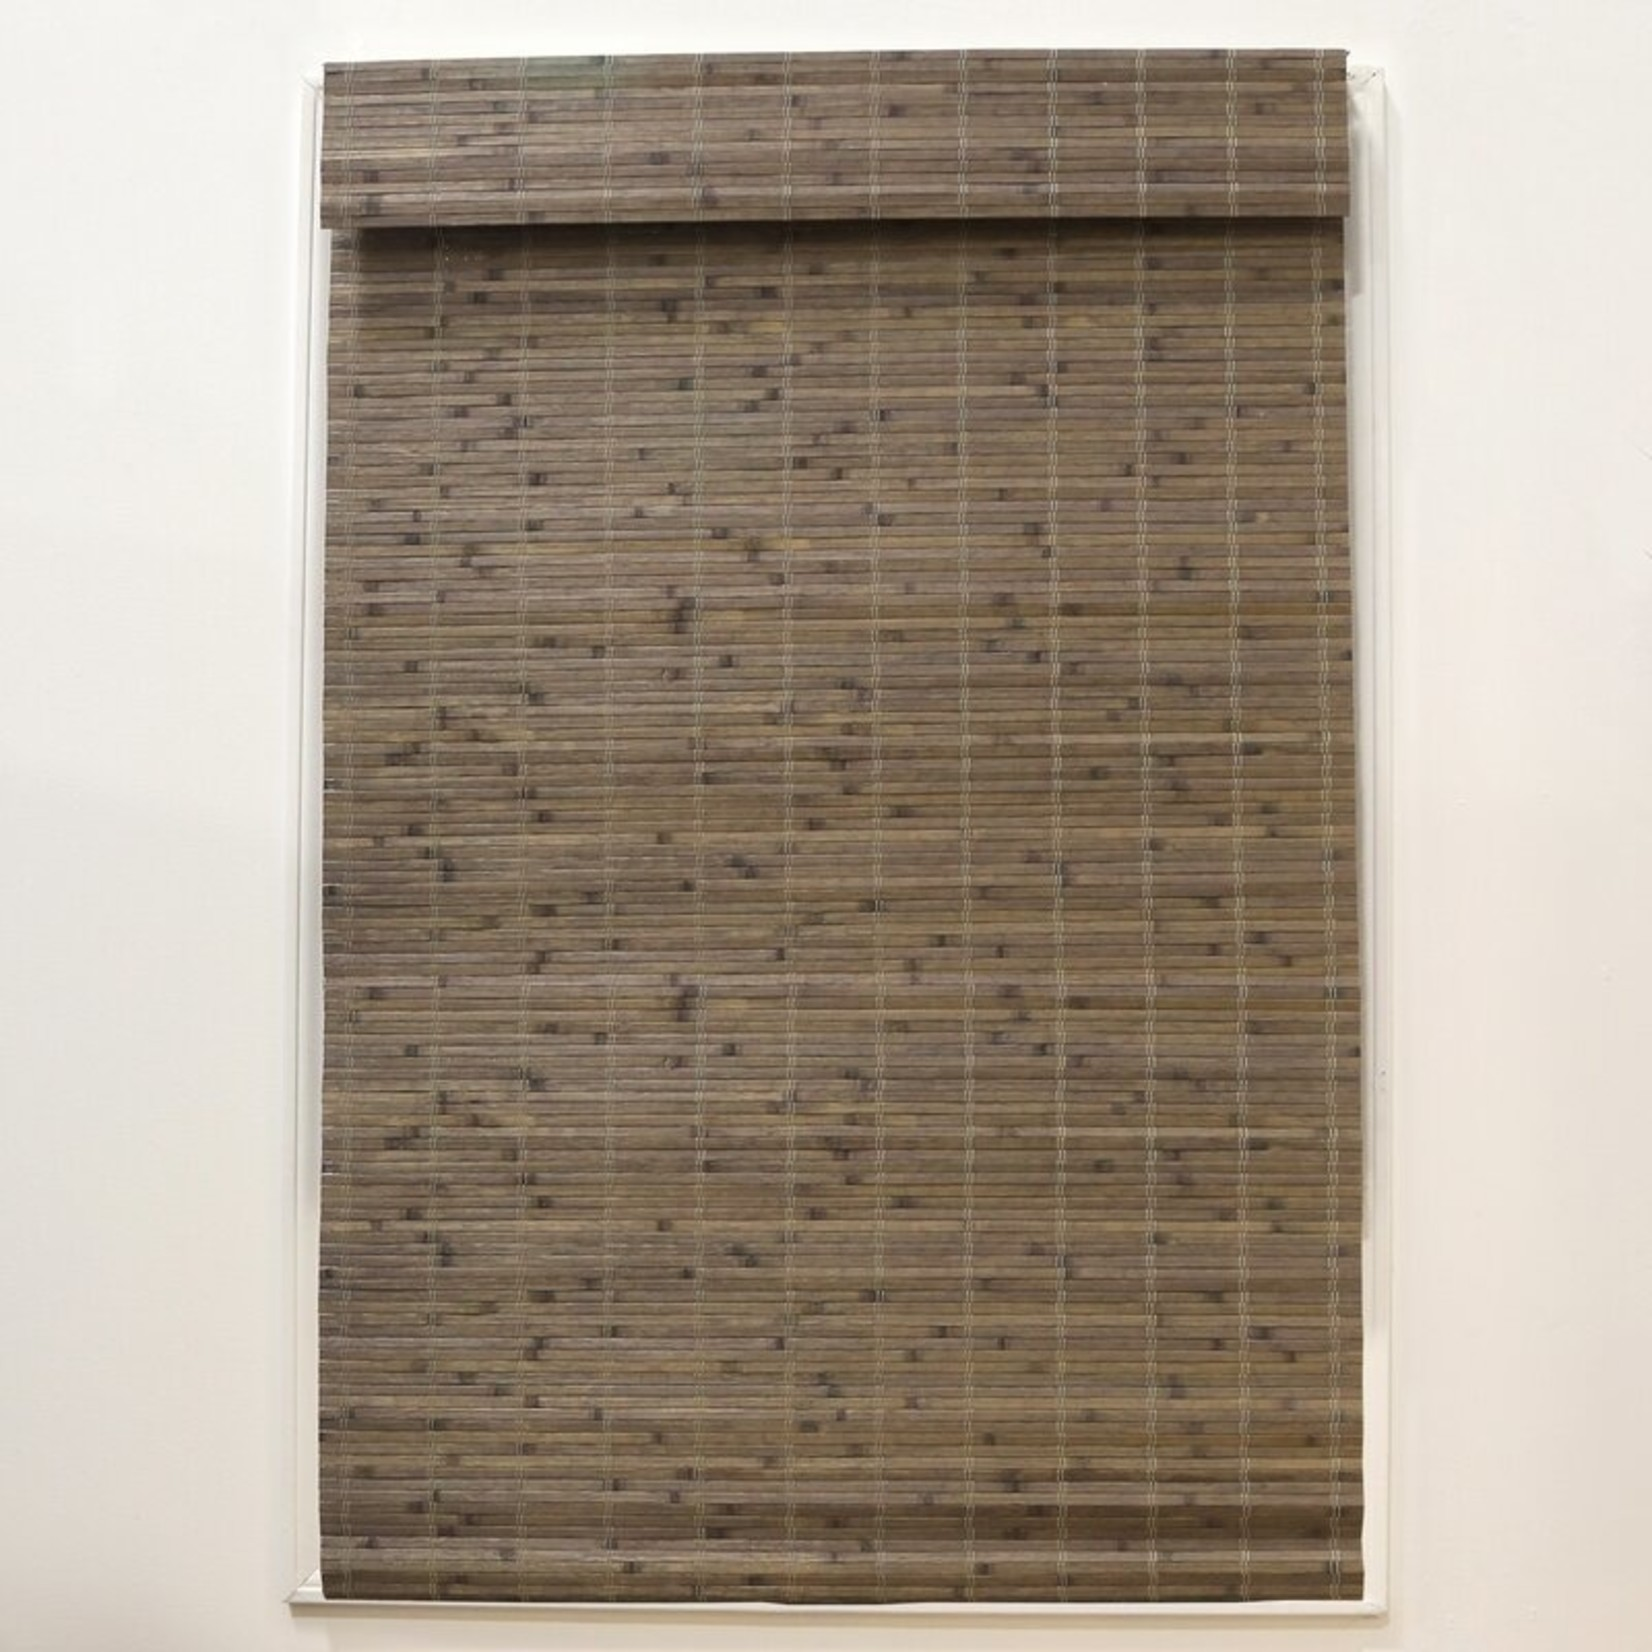 "*Gyala Cordless Flatstick Semi-Sheer Roman Shade - 29.5"" x 64"" - Driftwood - Final Sale"